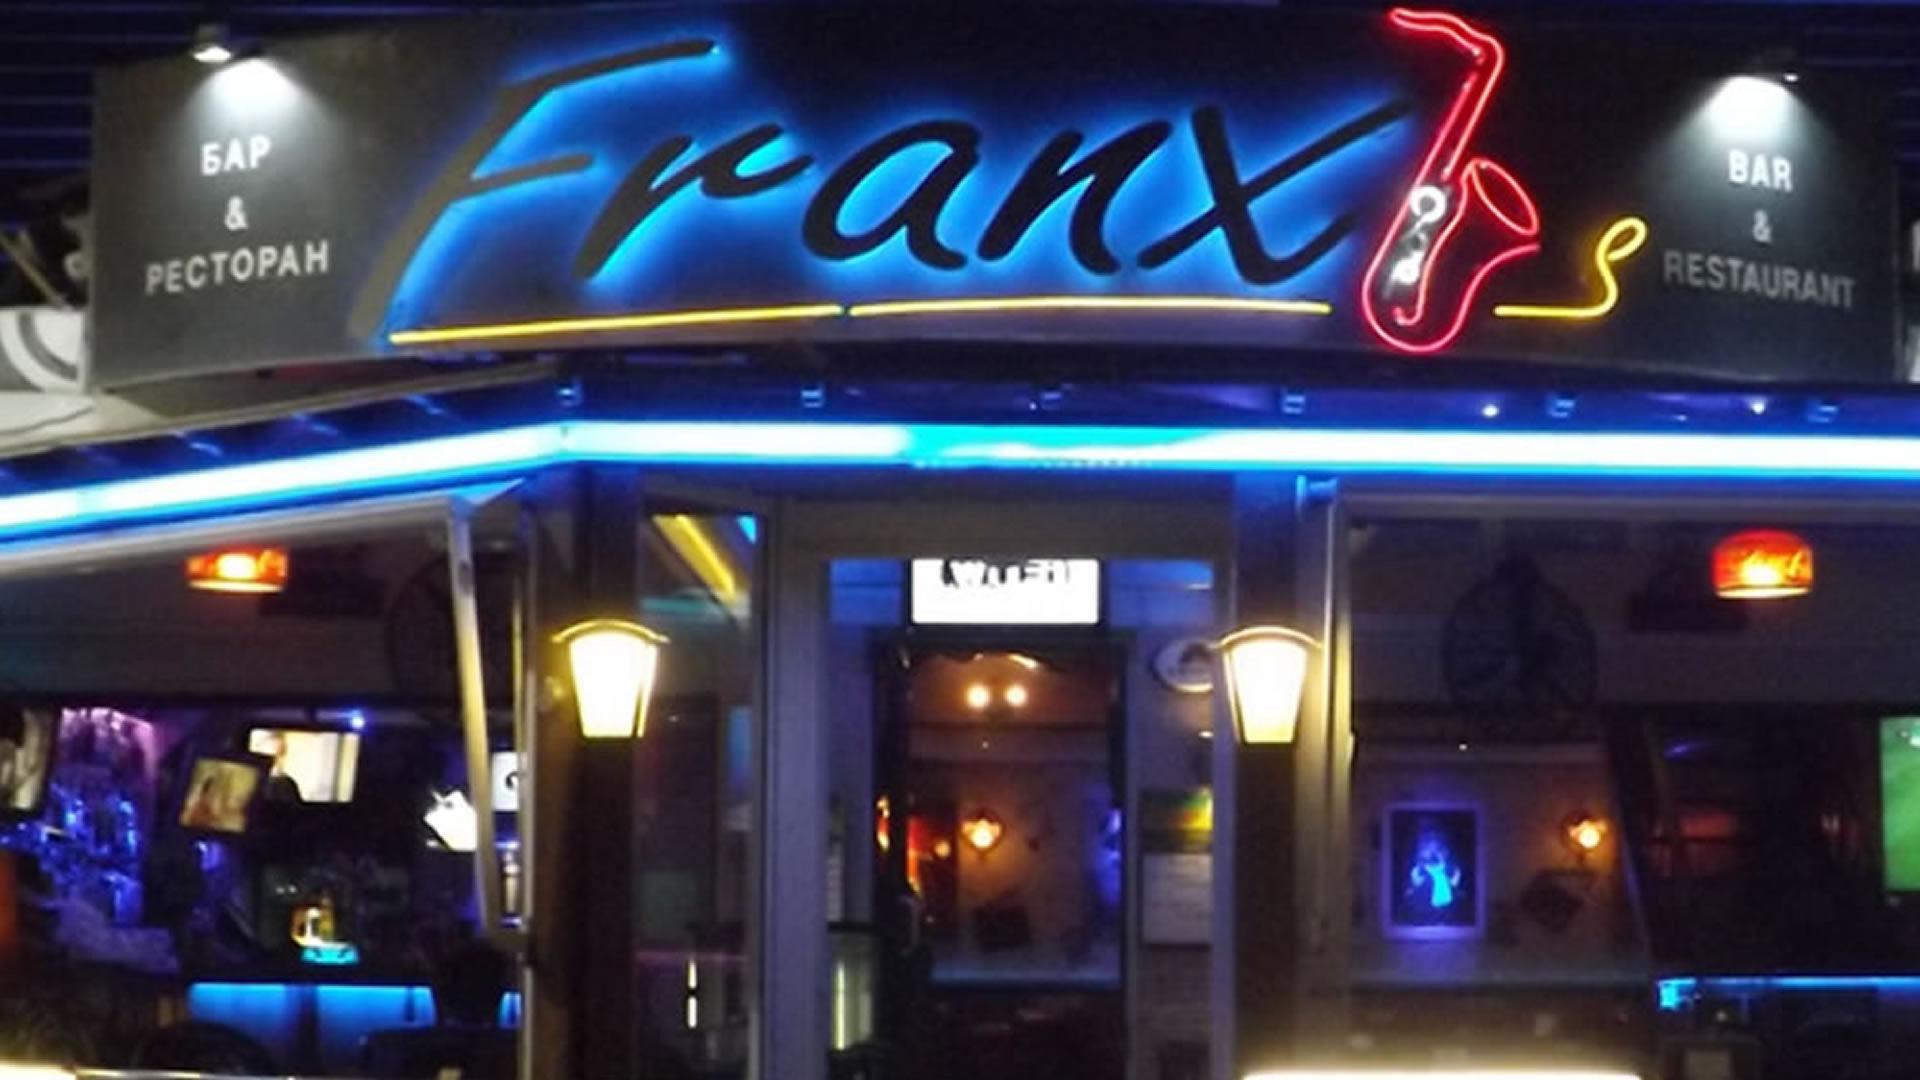 Franx Bar and Restaurant